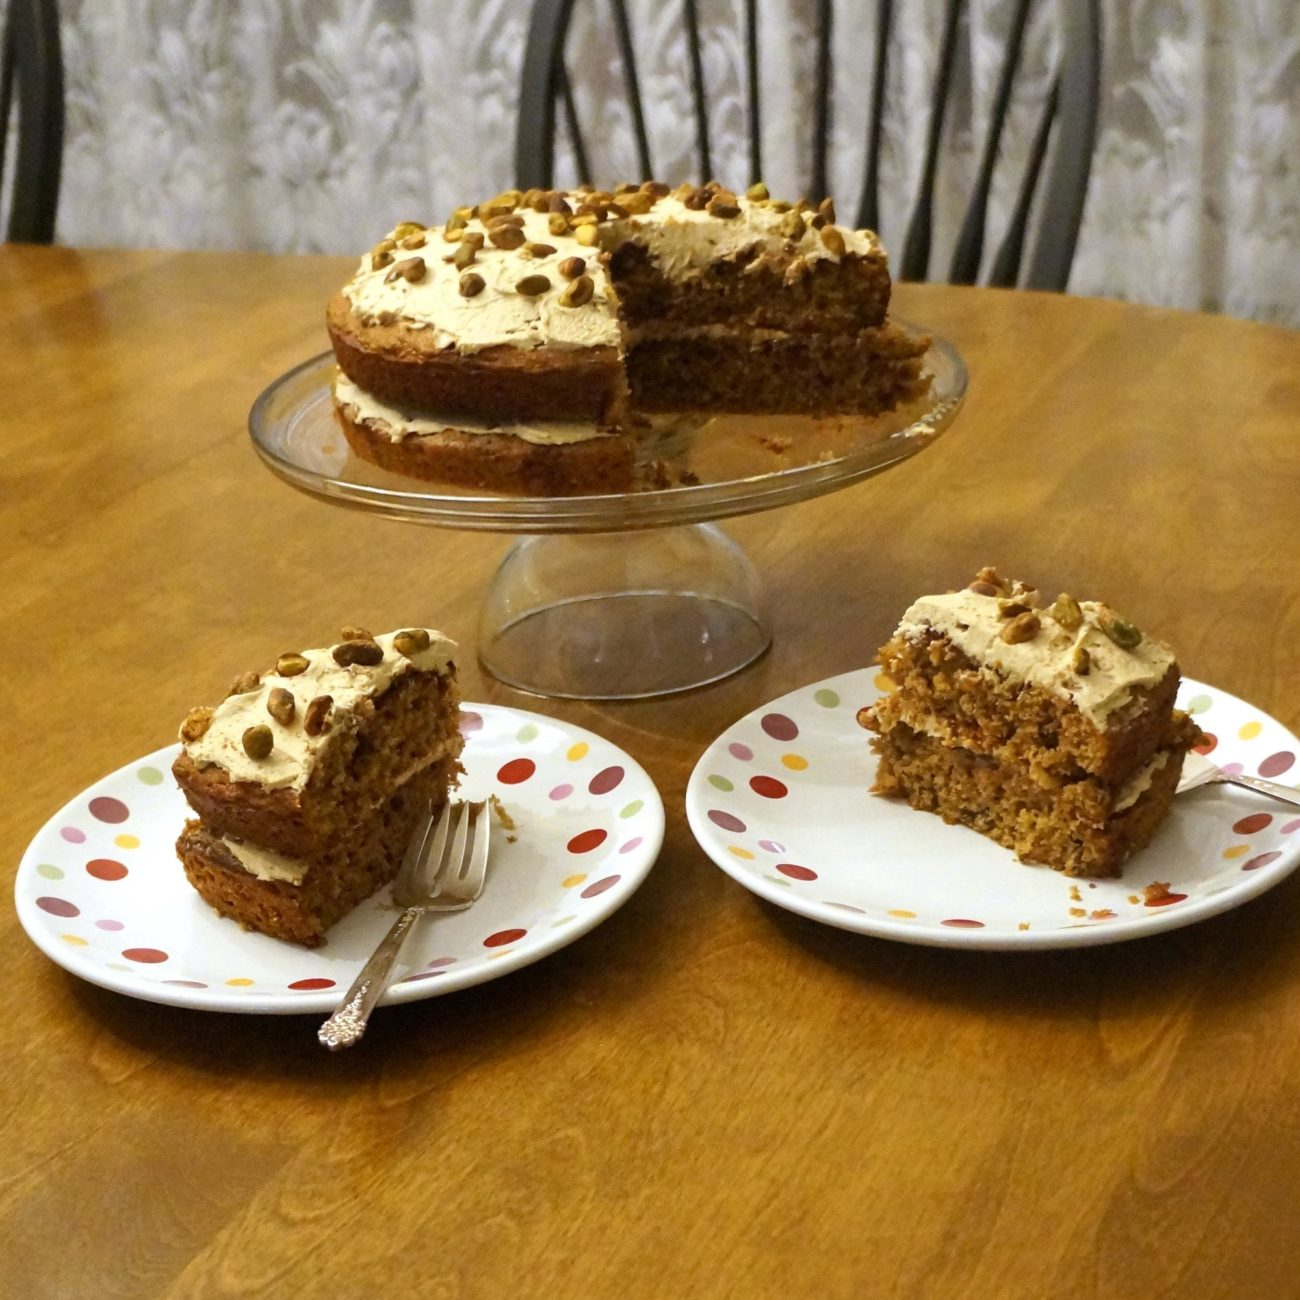 ESPRESSO AND CARDAMOM CAKE WITH PISTACHIOS